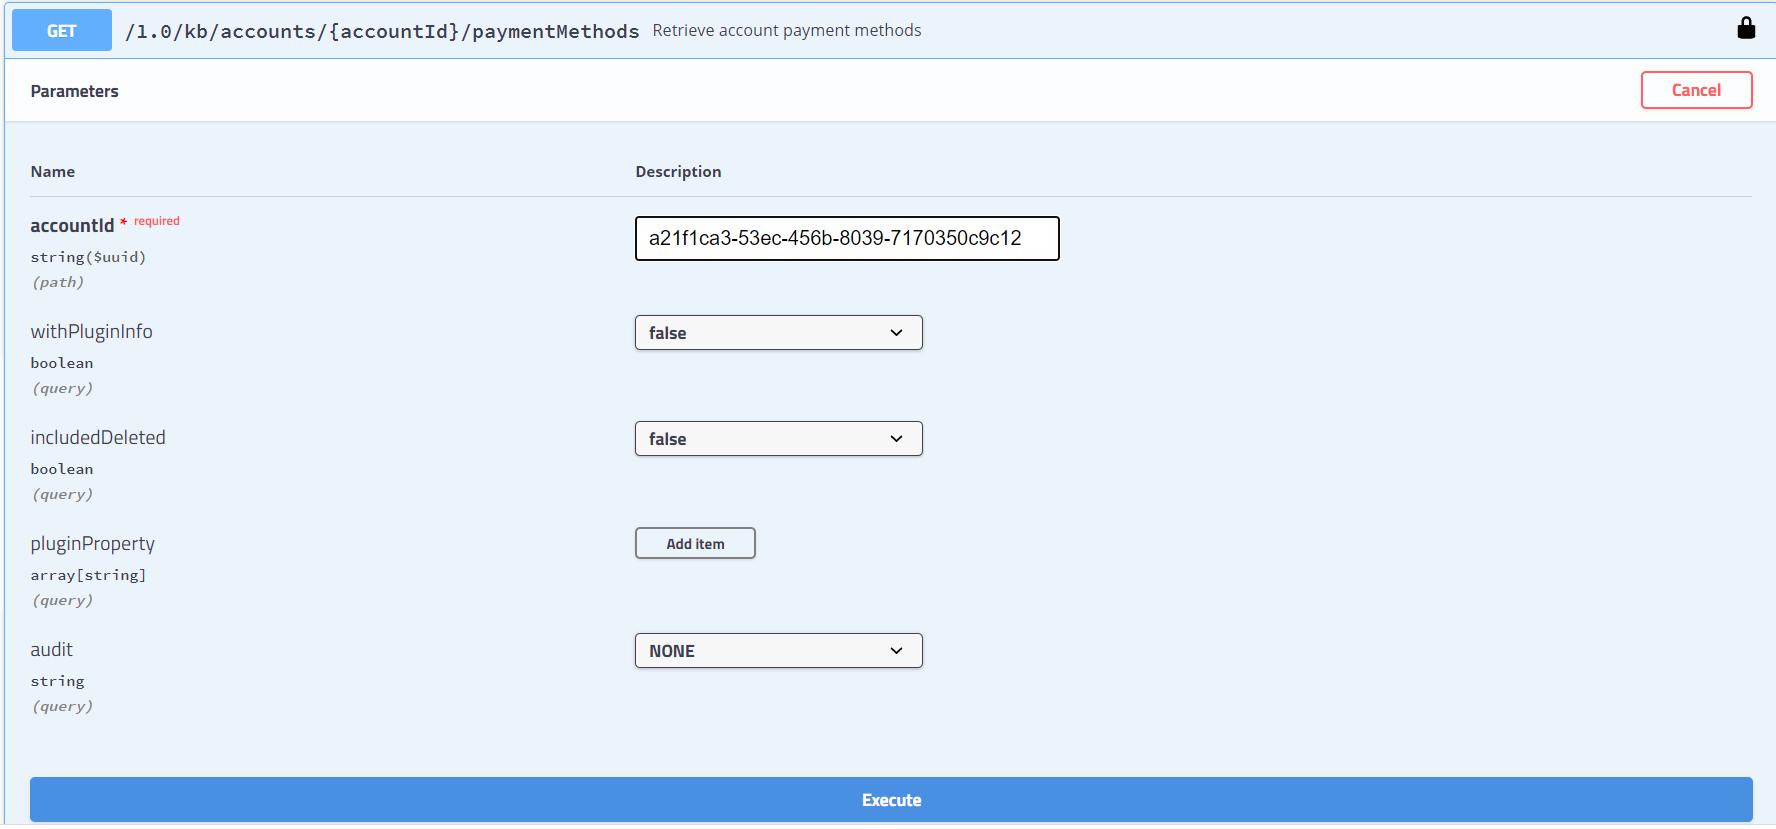 retrieve account payment method execution2